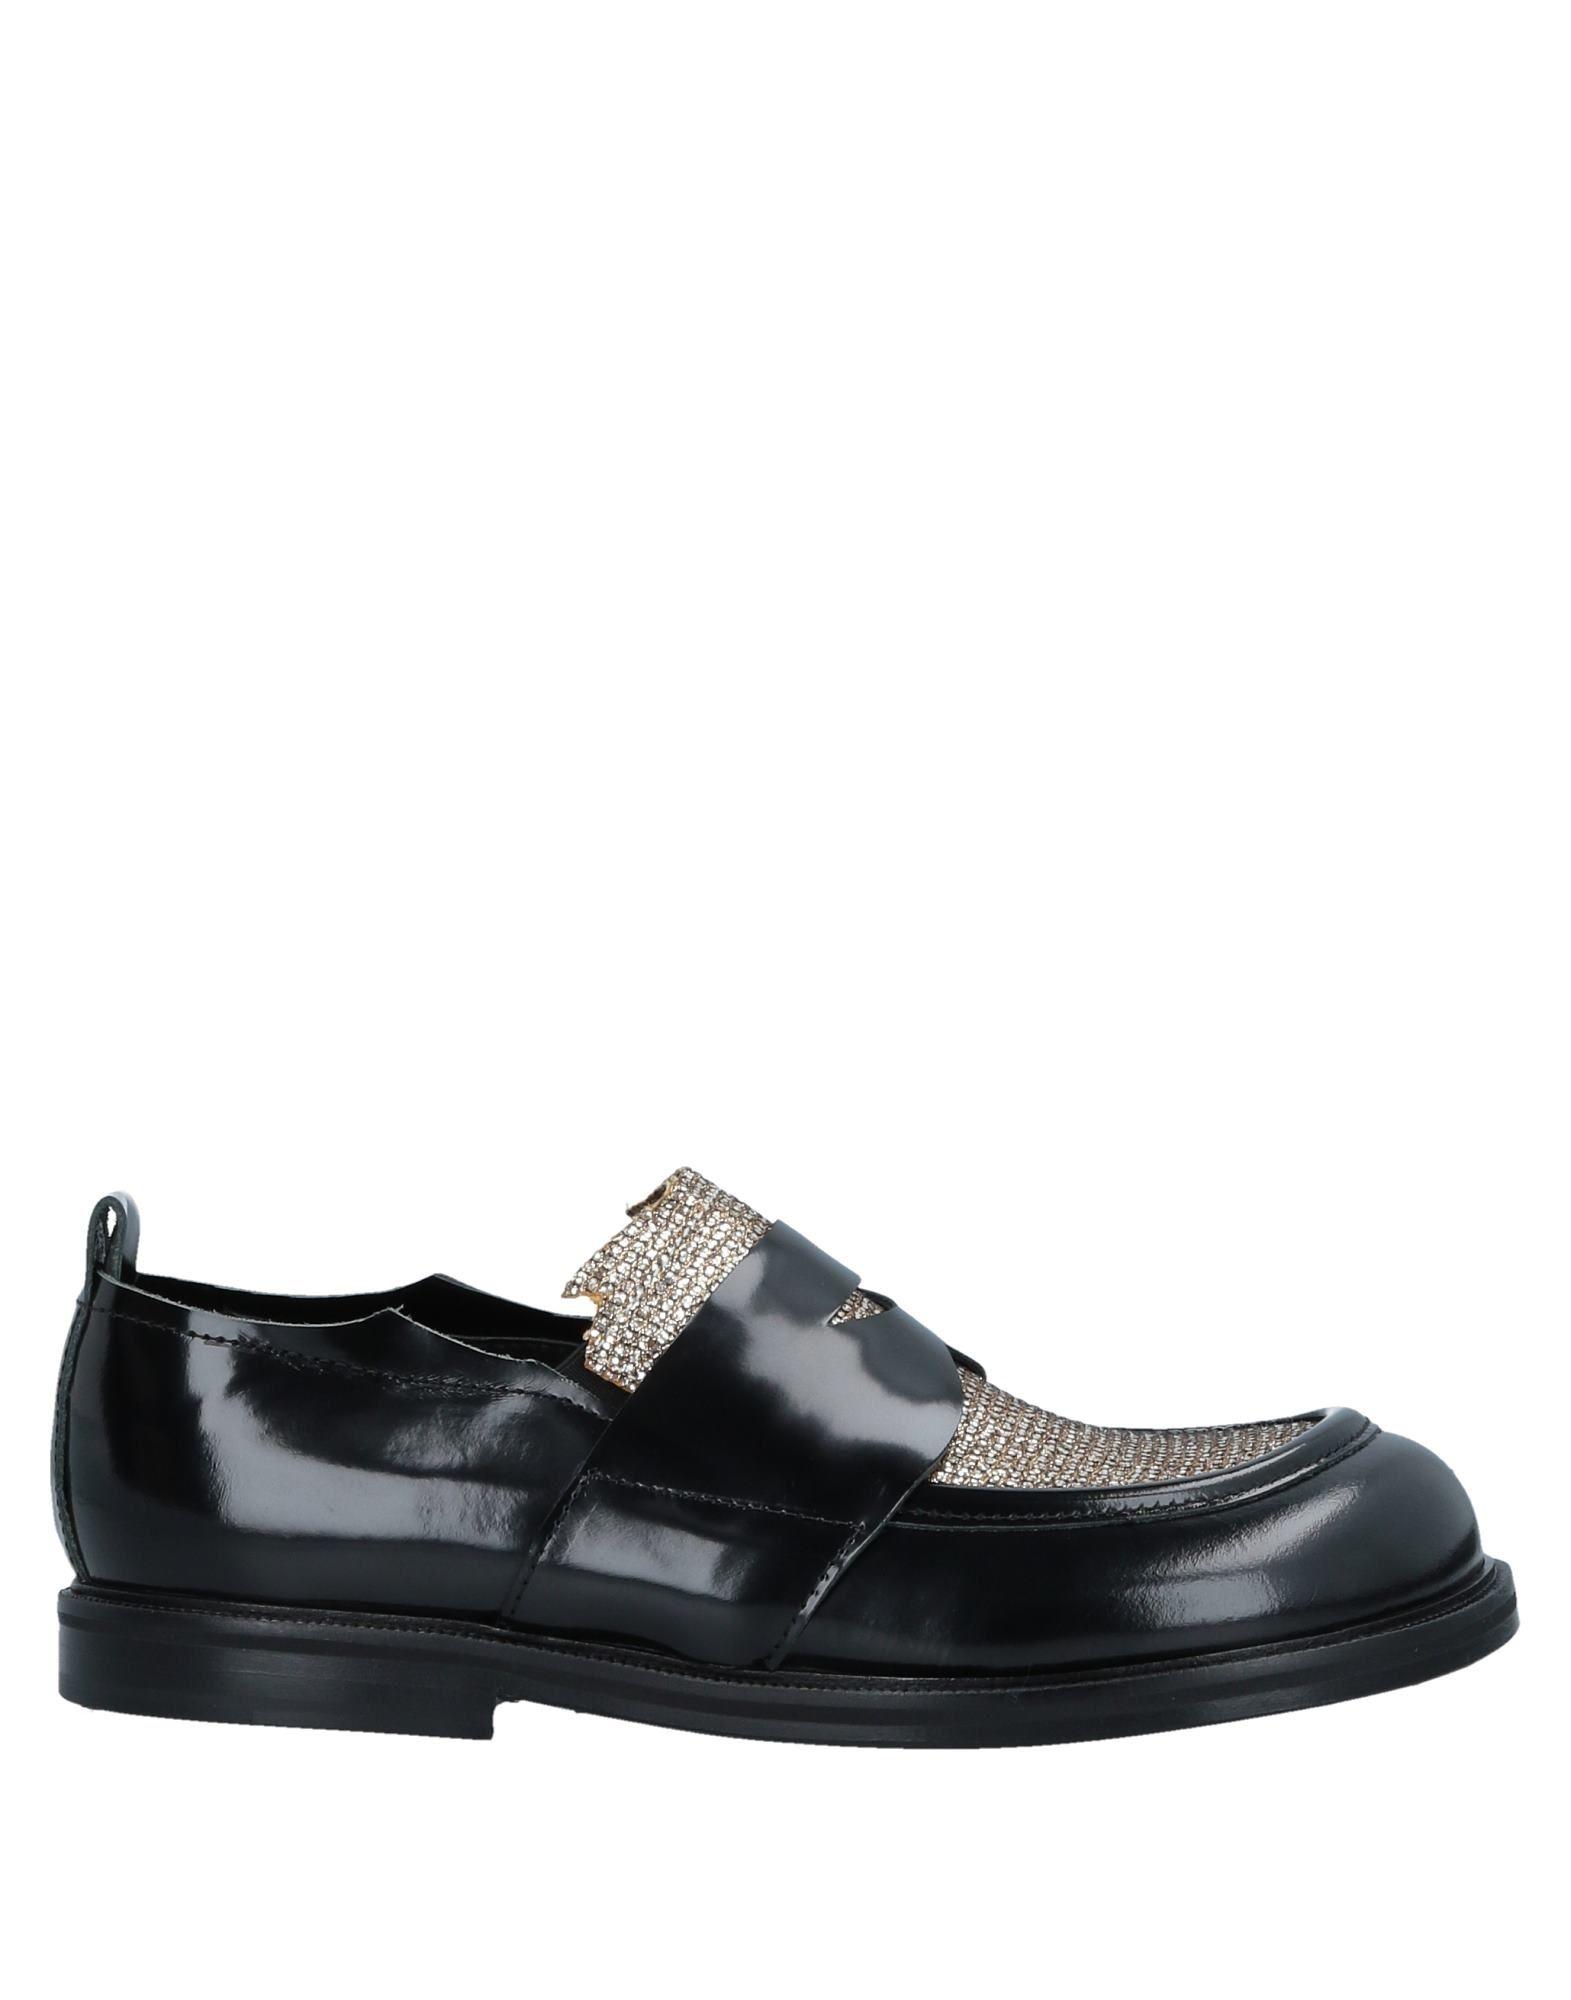 Tipe E Tacchi Mokassins Schuhe Damen  11520835AU Neue Schuhe Mokassins 96250b